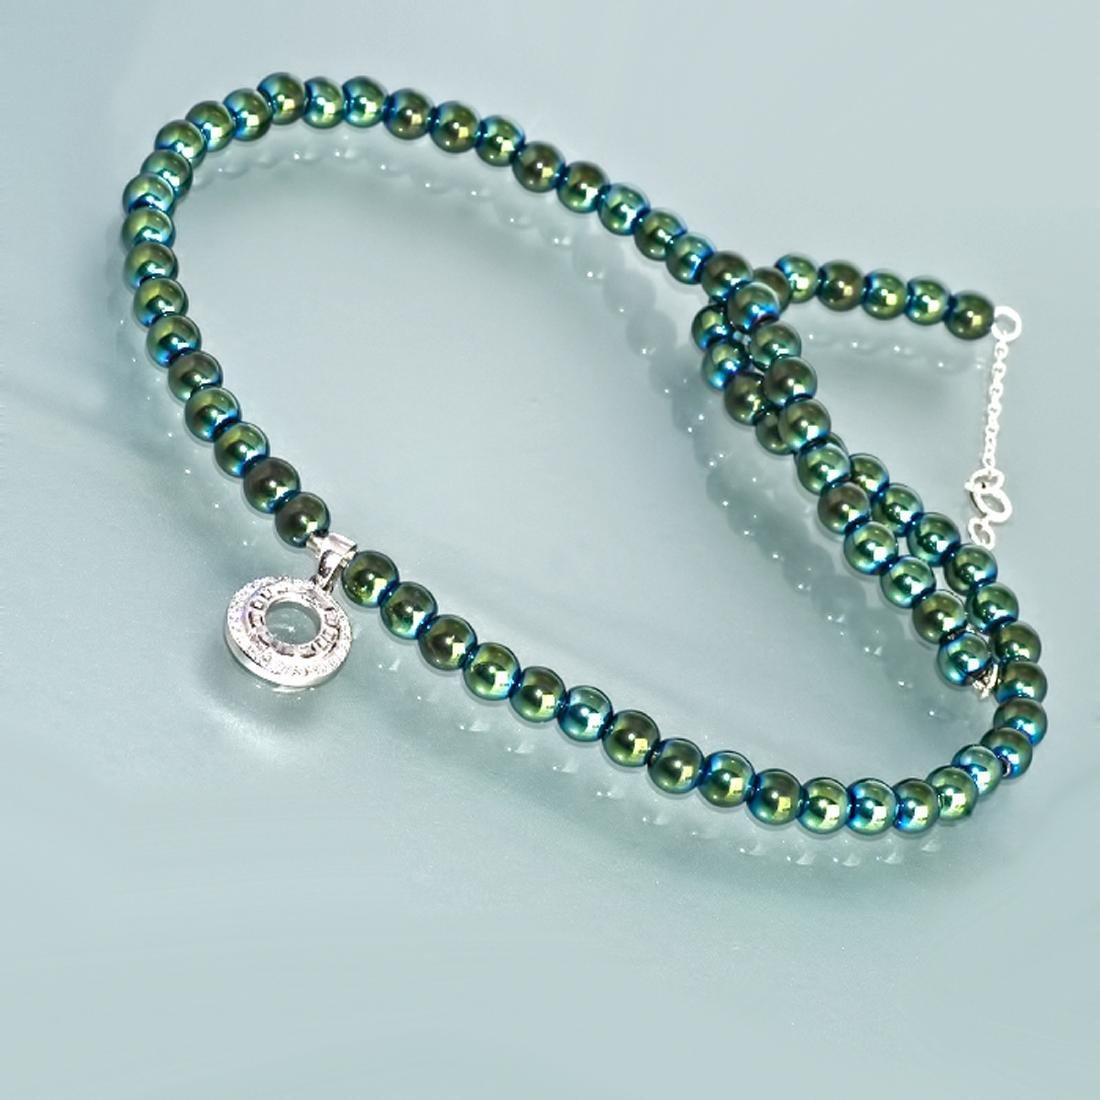 Sterling Silver Green Mirror Hematite Zirconia Necklace - 5